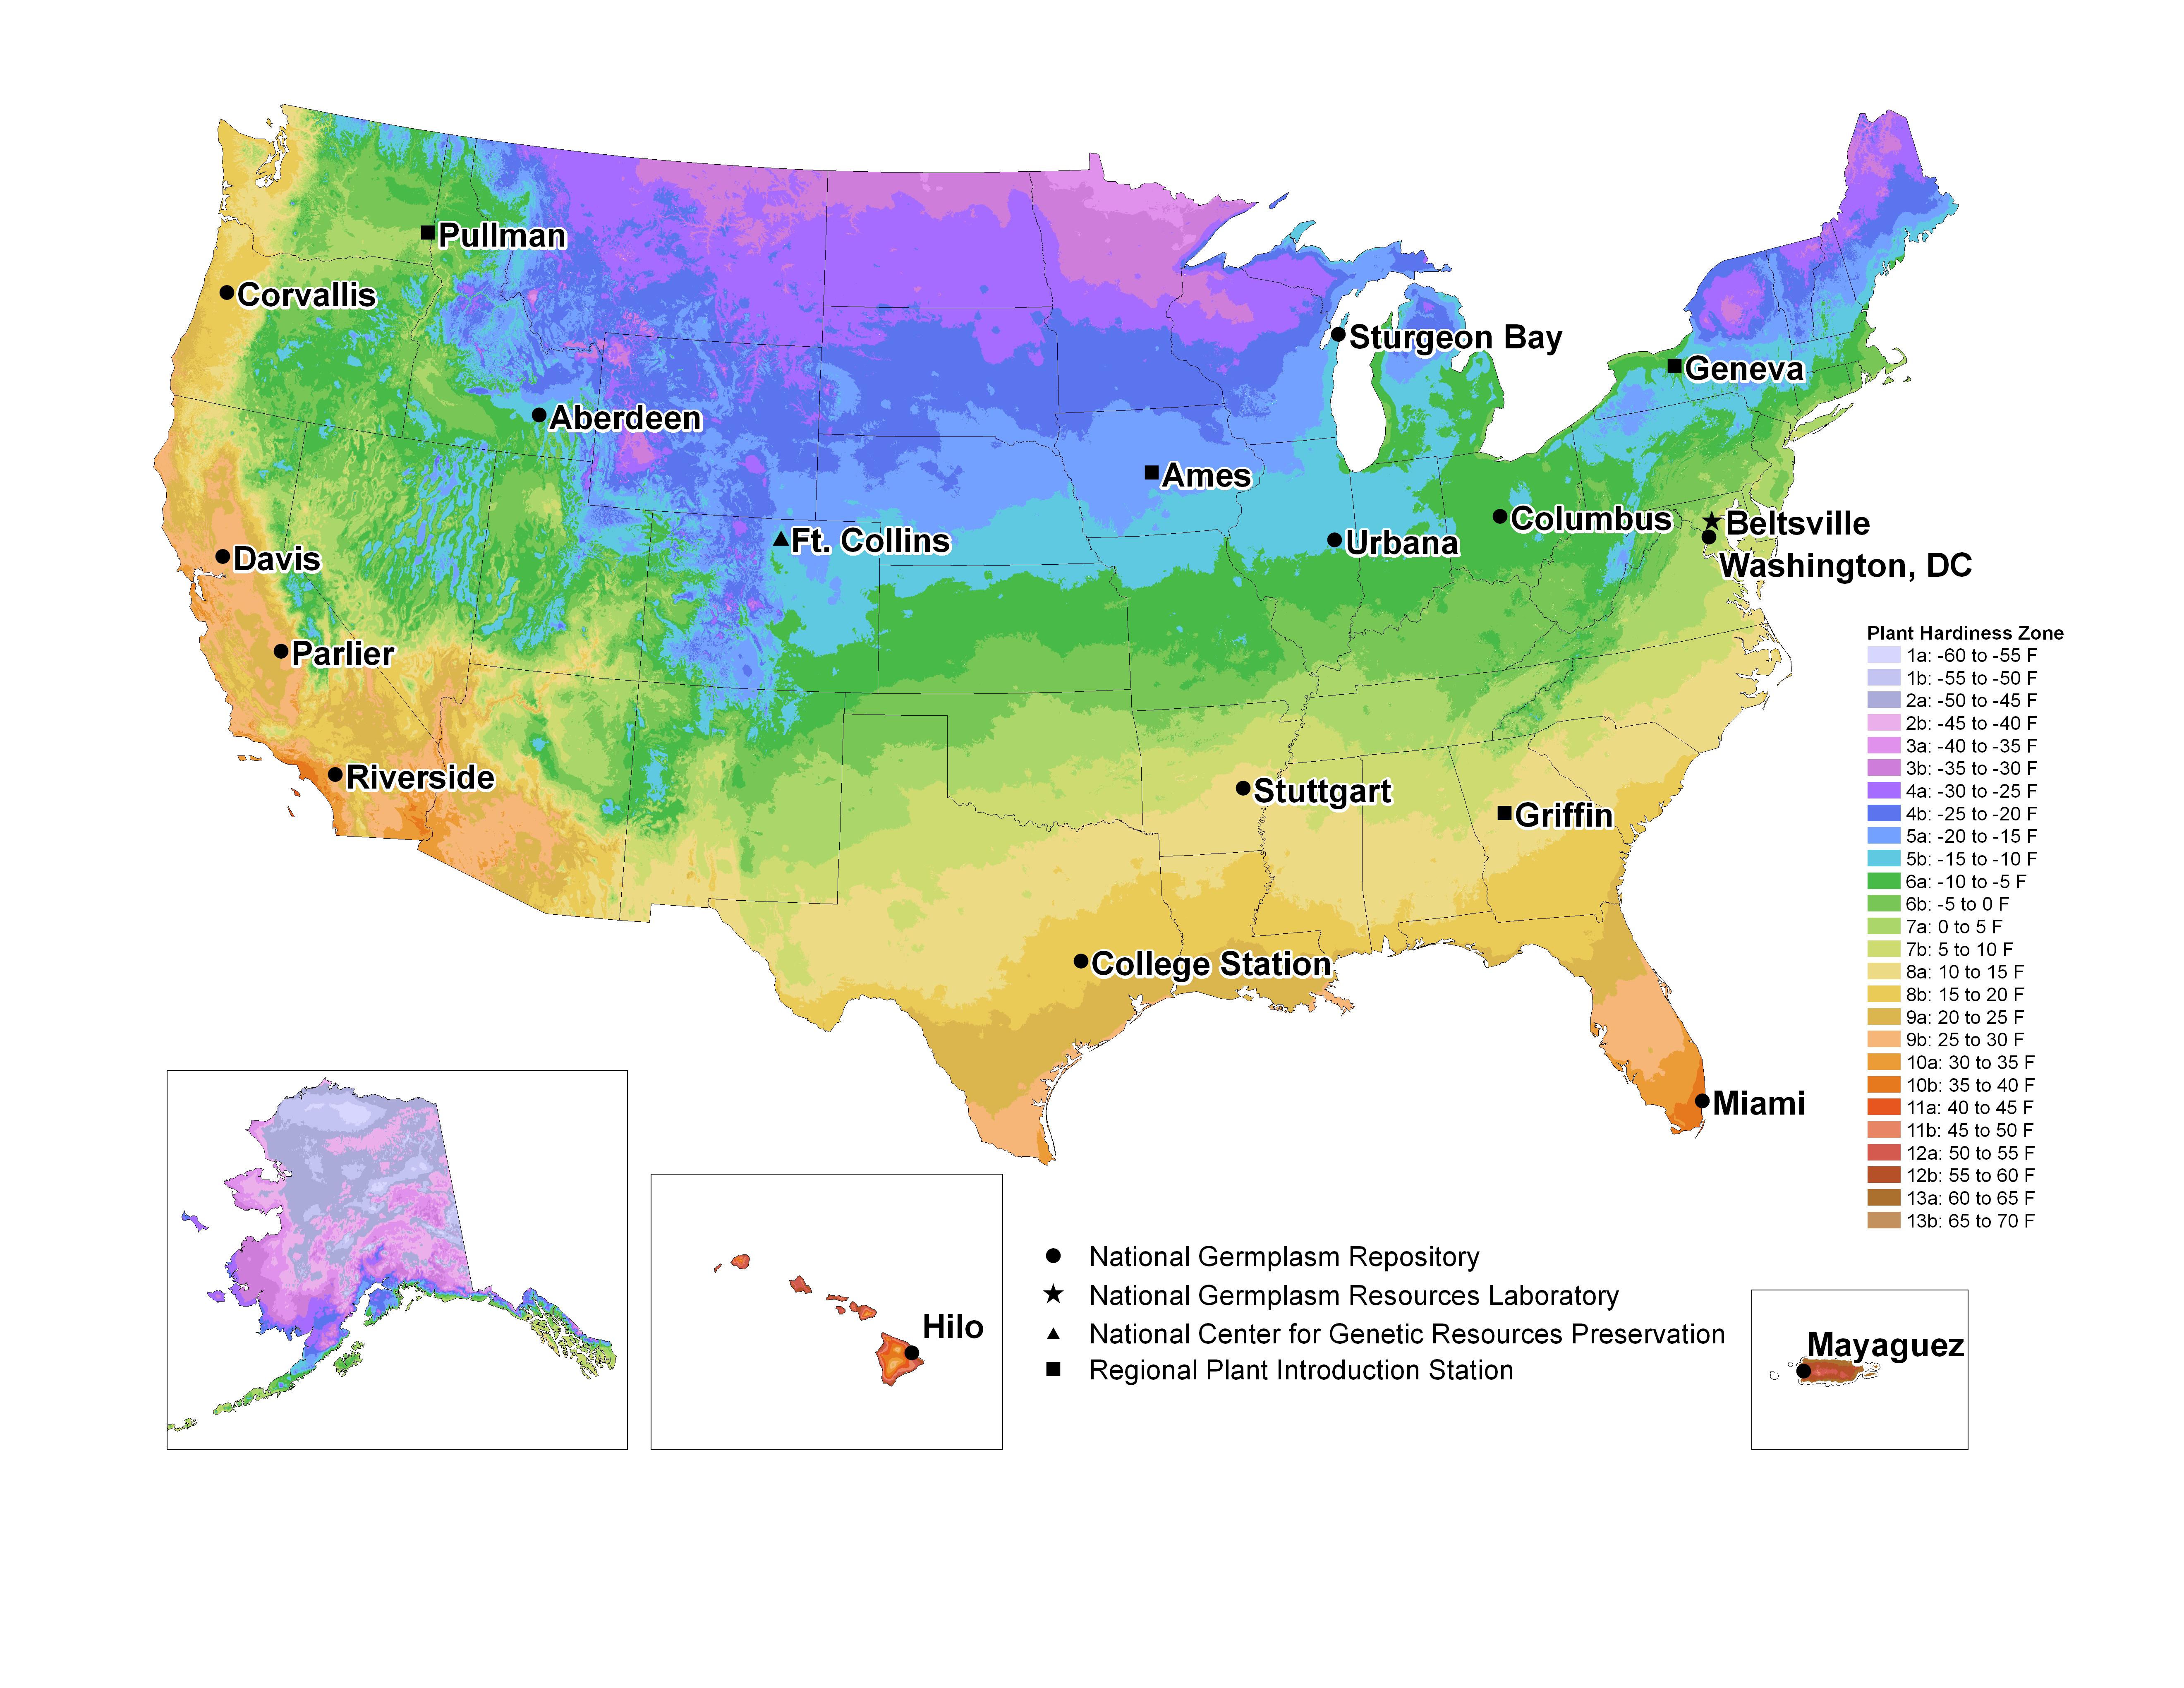 usda plant hardiness zone map with genebanks